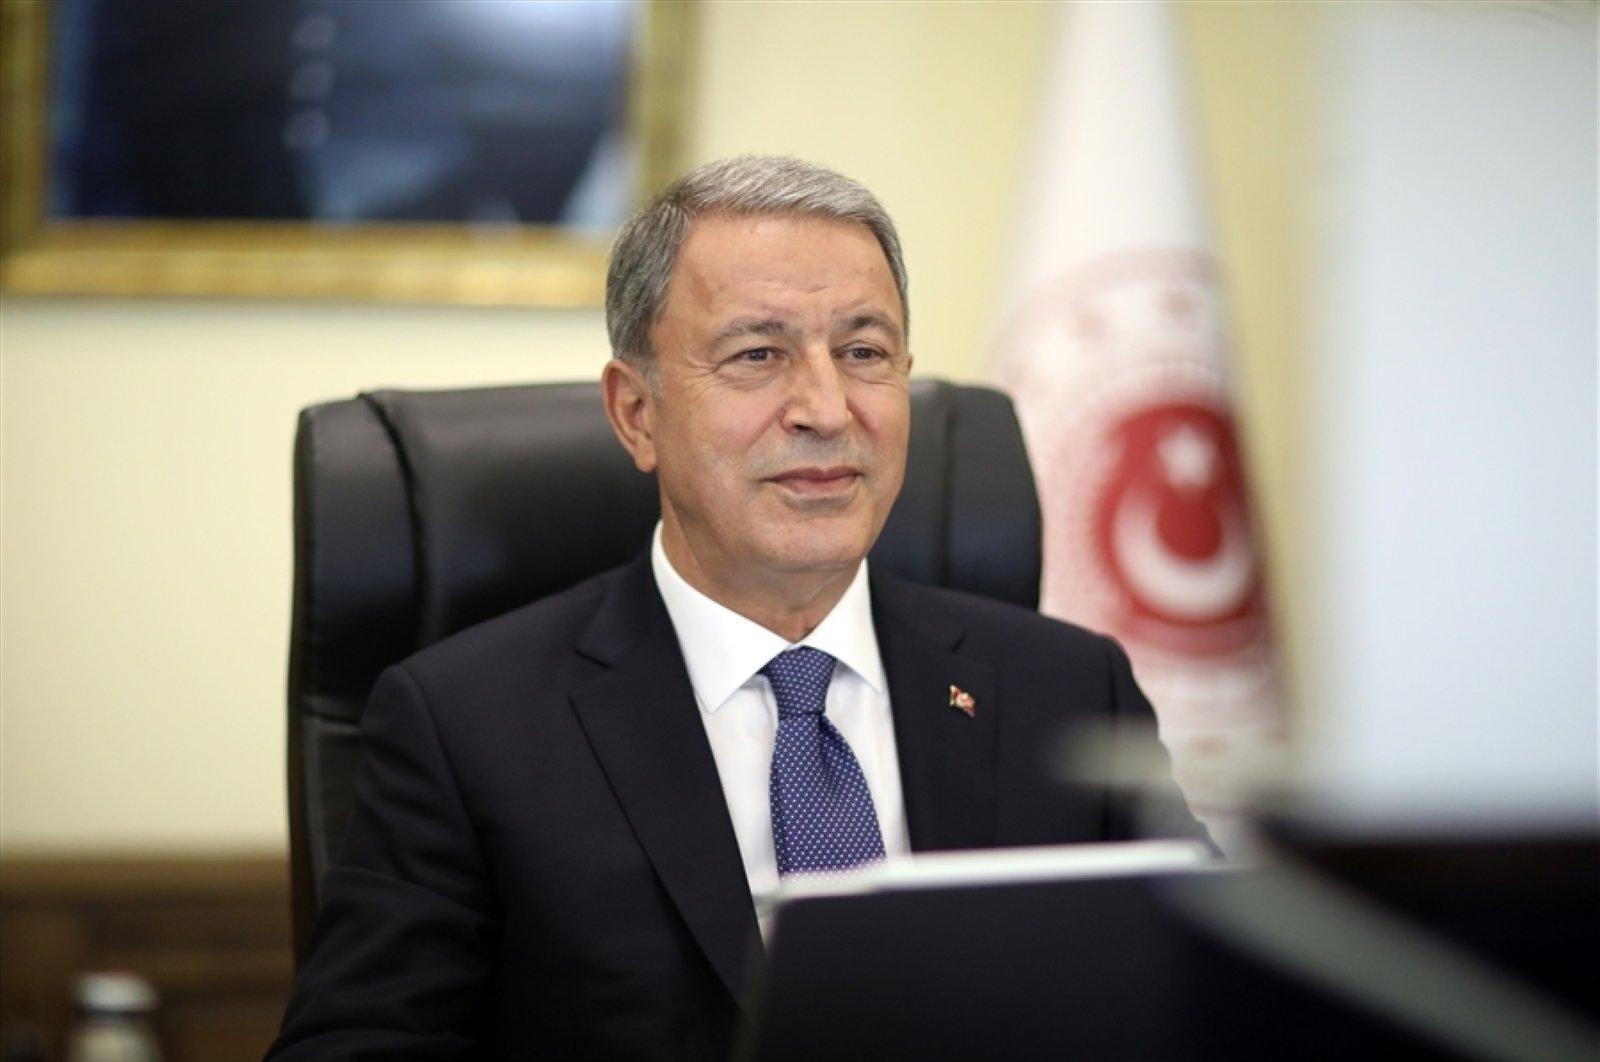 Defense Minister Hulusi Akar speaks at a panel organized by the Washington, D.C.-based Turkish Heritage Organization, July 29, 2020. (DHA)